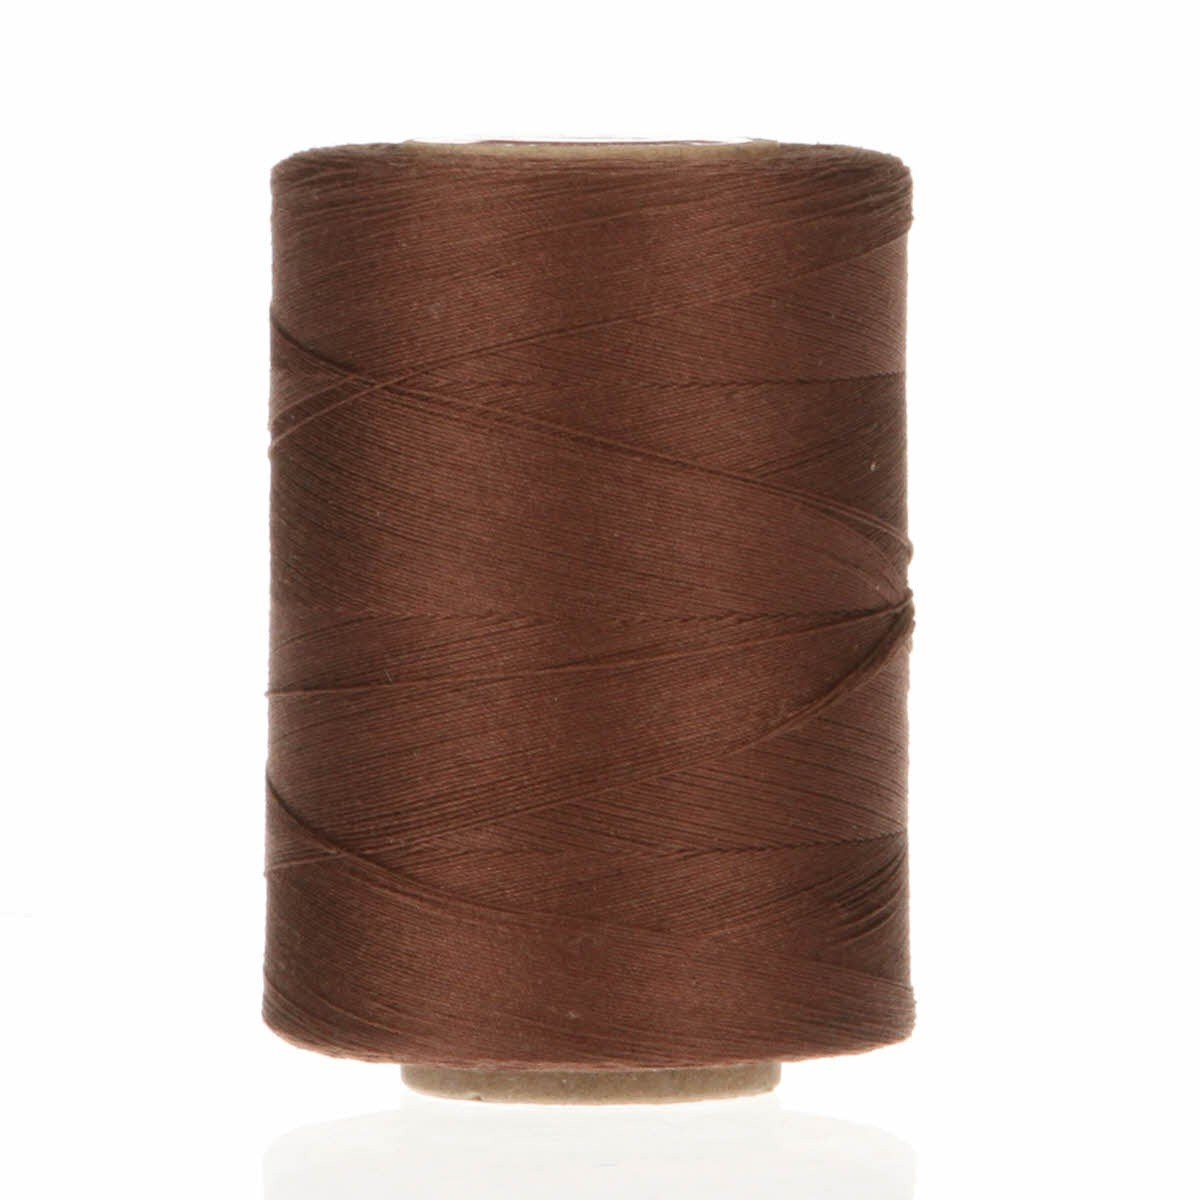 YLI Star Thread V37-8890 3-Ply T-35 Cotton Quilting /& Craft Thread Dark Brown 1200 yd